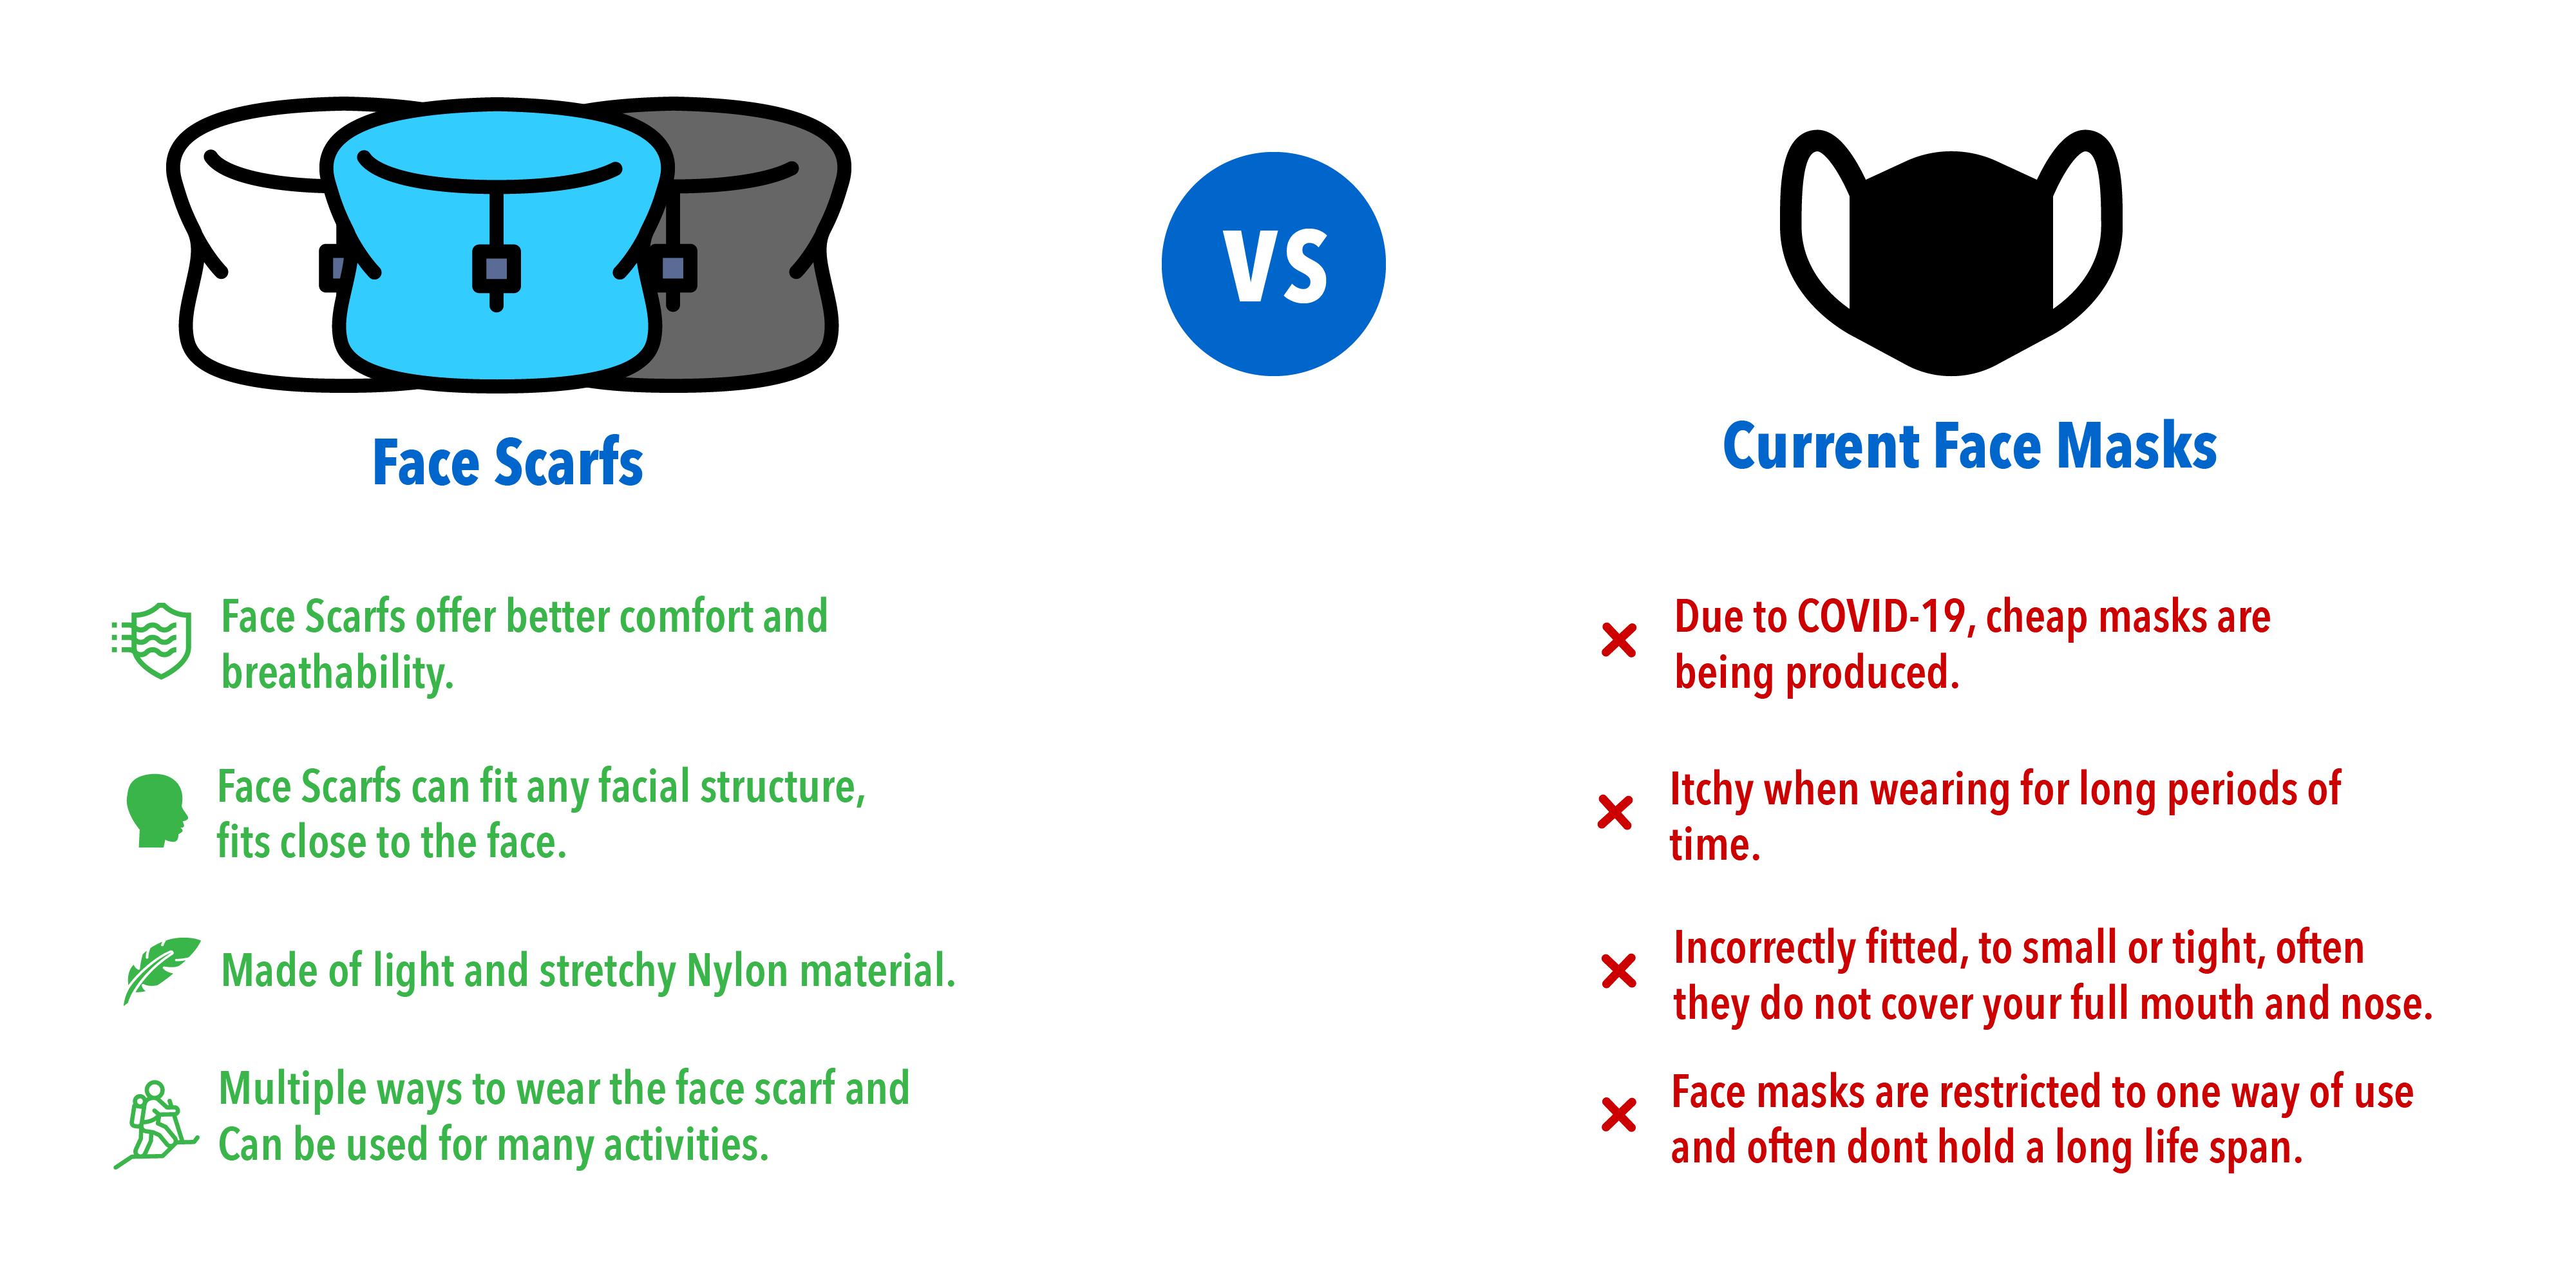 Face Scarfs vs Face Masks